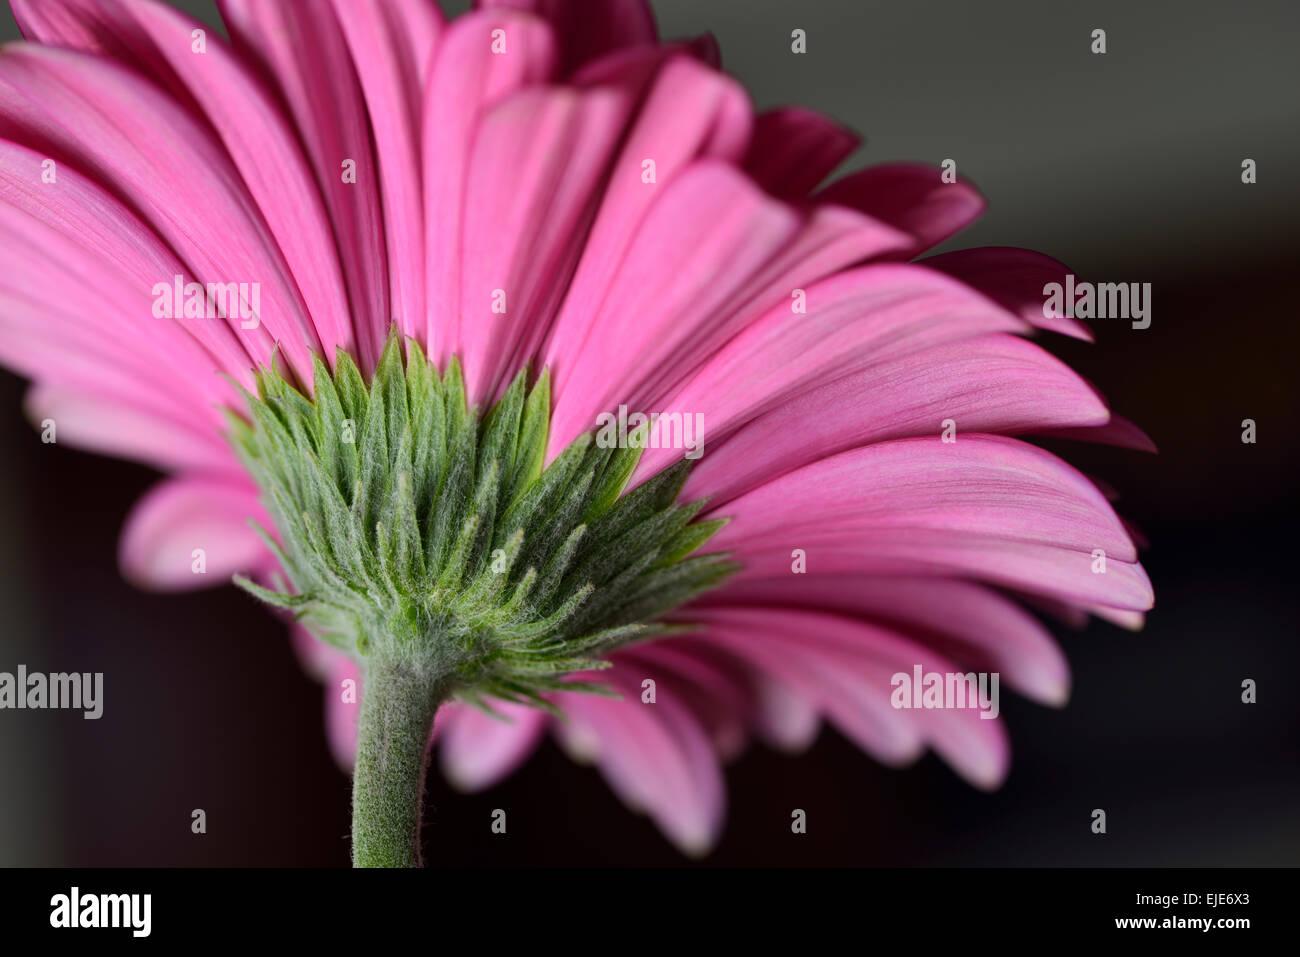 Underside daisy flower stock photos underside daisy flower stock underside of a pink gerbera daisy flower with a dark background stock image izmirmasajfo